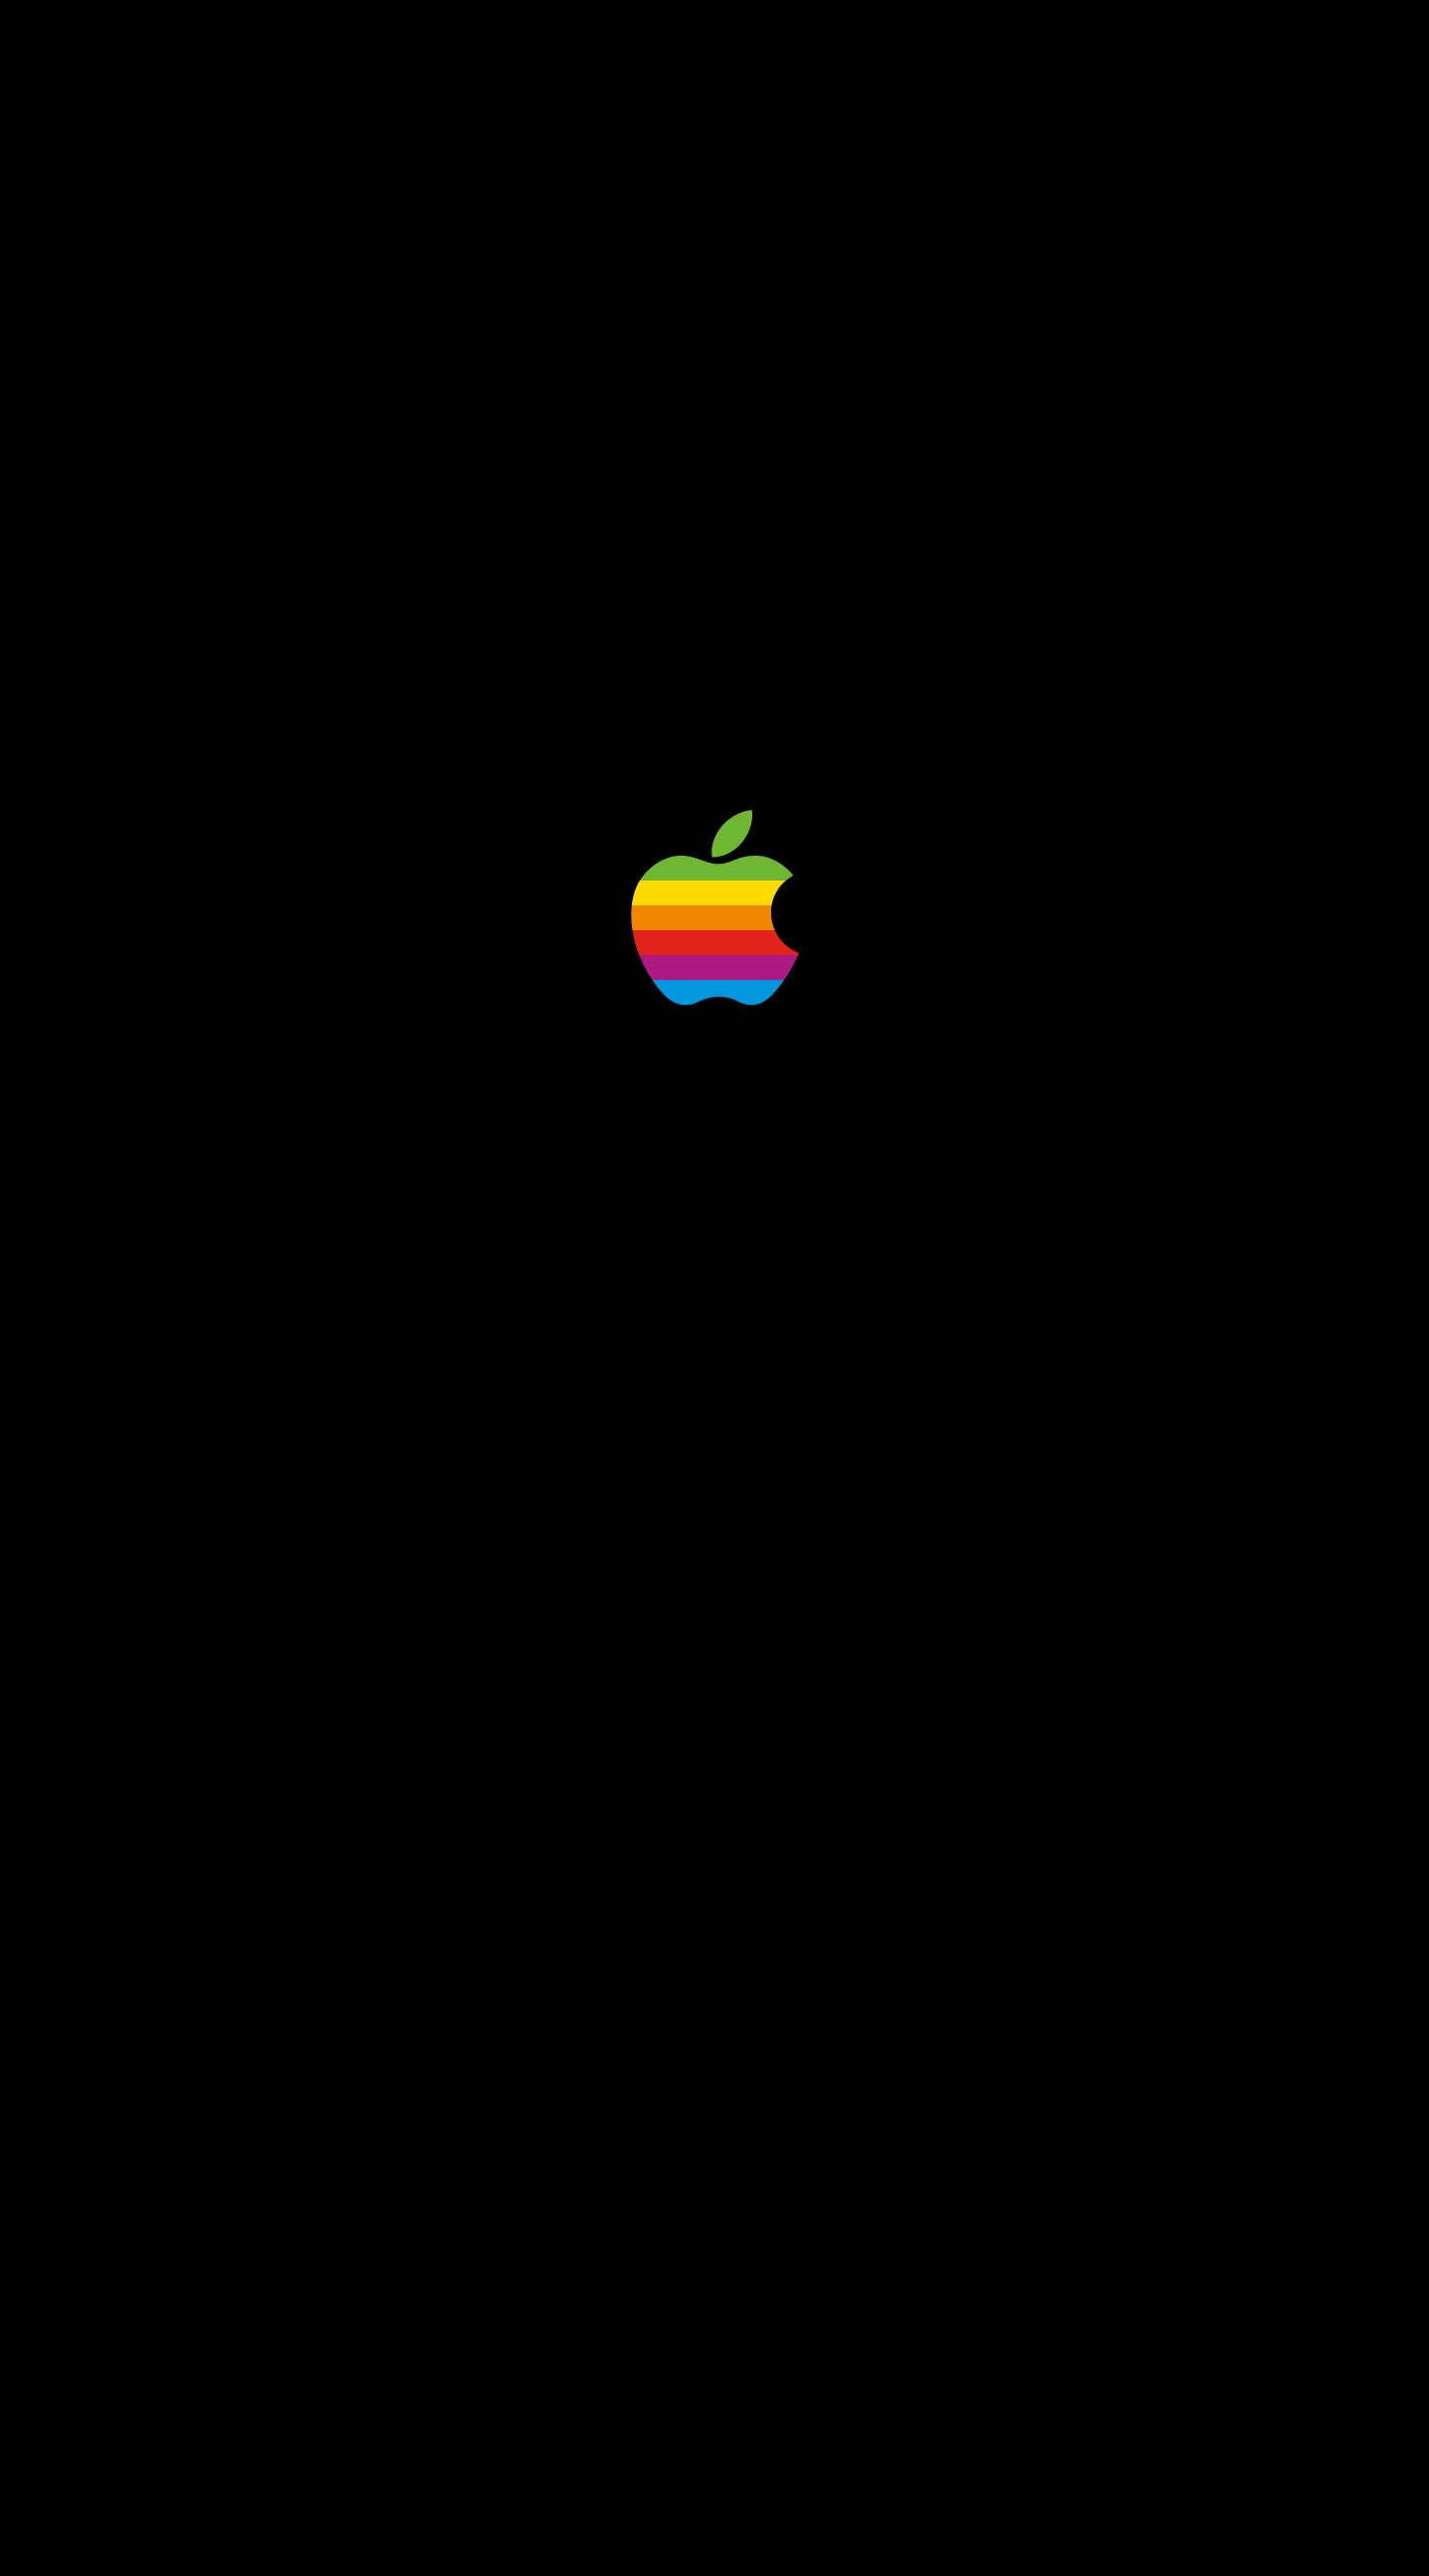 Apple レインボーロゴ壁紙配布します Imac Macbook Ipad Iphone X